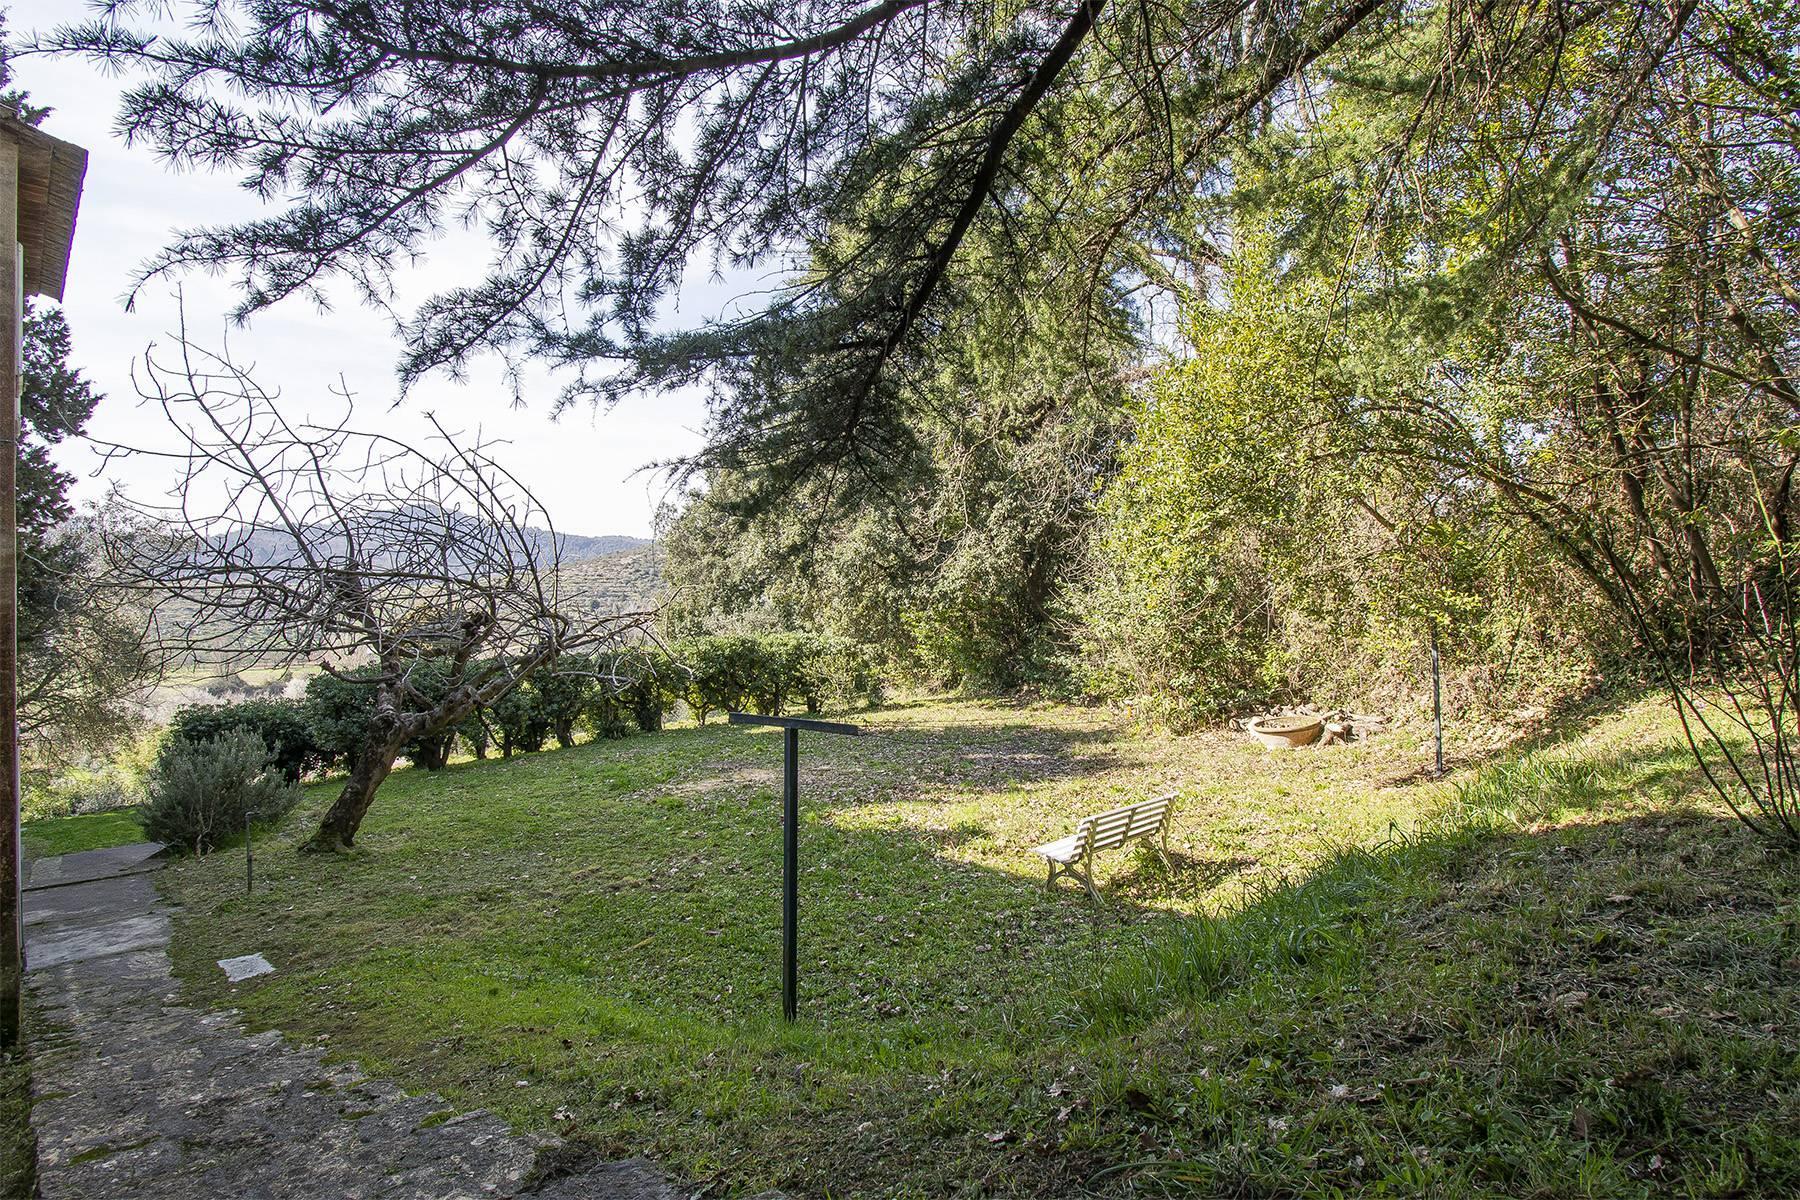 Romantic villa on the hills between Pisa and Lucca - 30